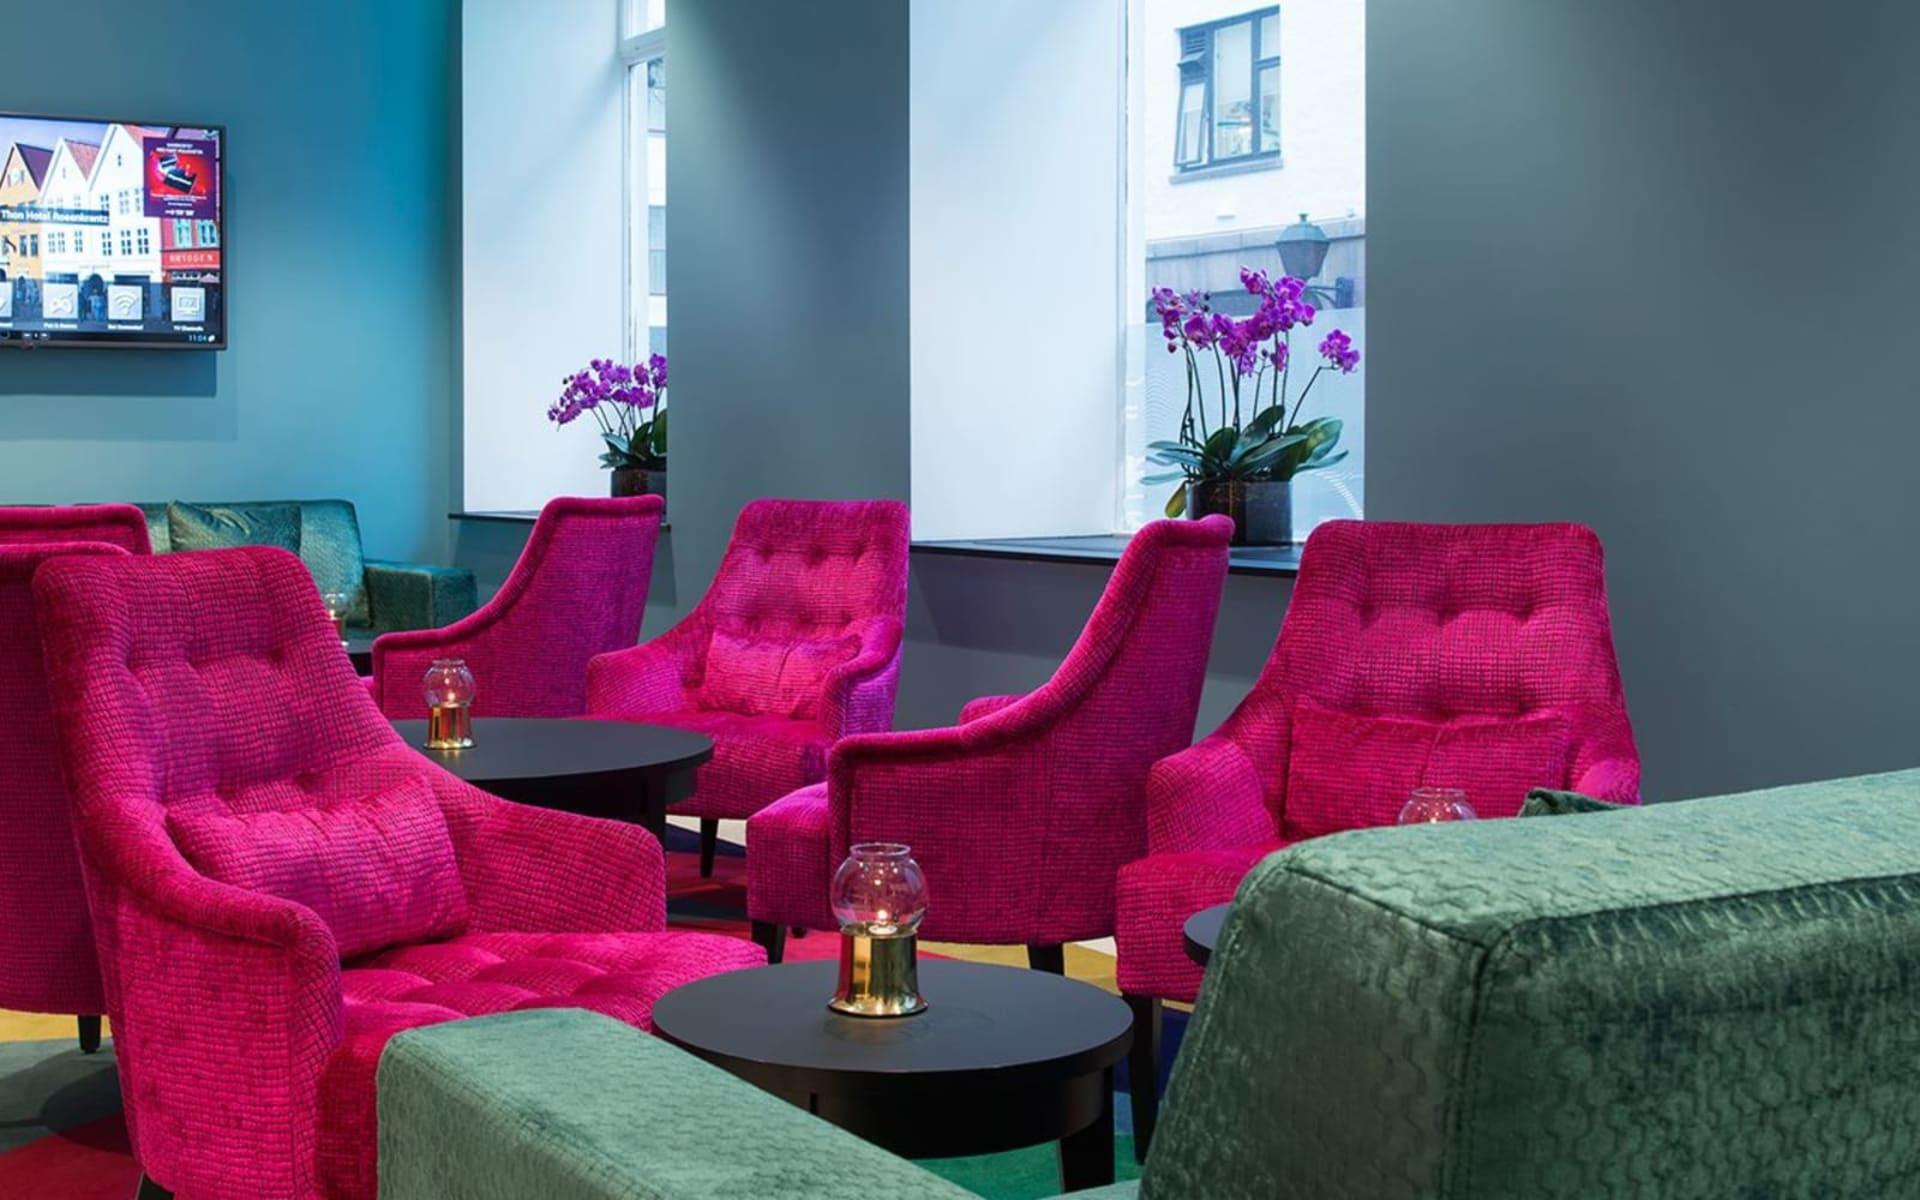 Thon Hotel Rosenkrantz in Bergen: ©Thon Hotels_thon-hotel-rosenkrantz-bergen-lobby